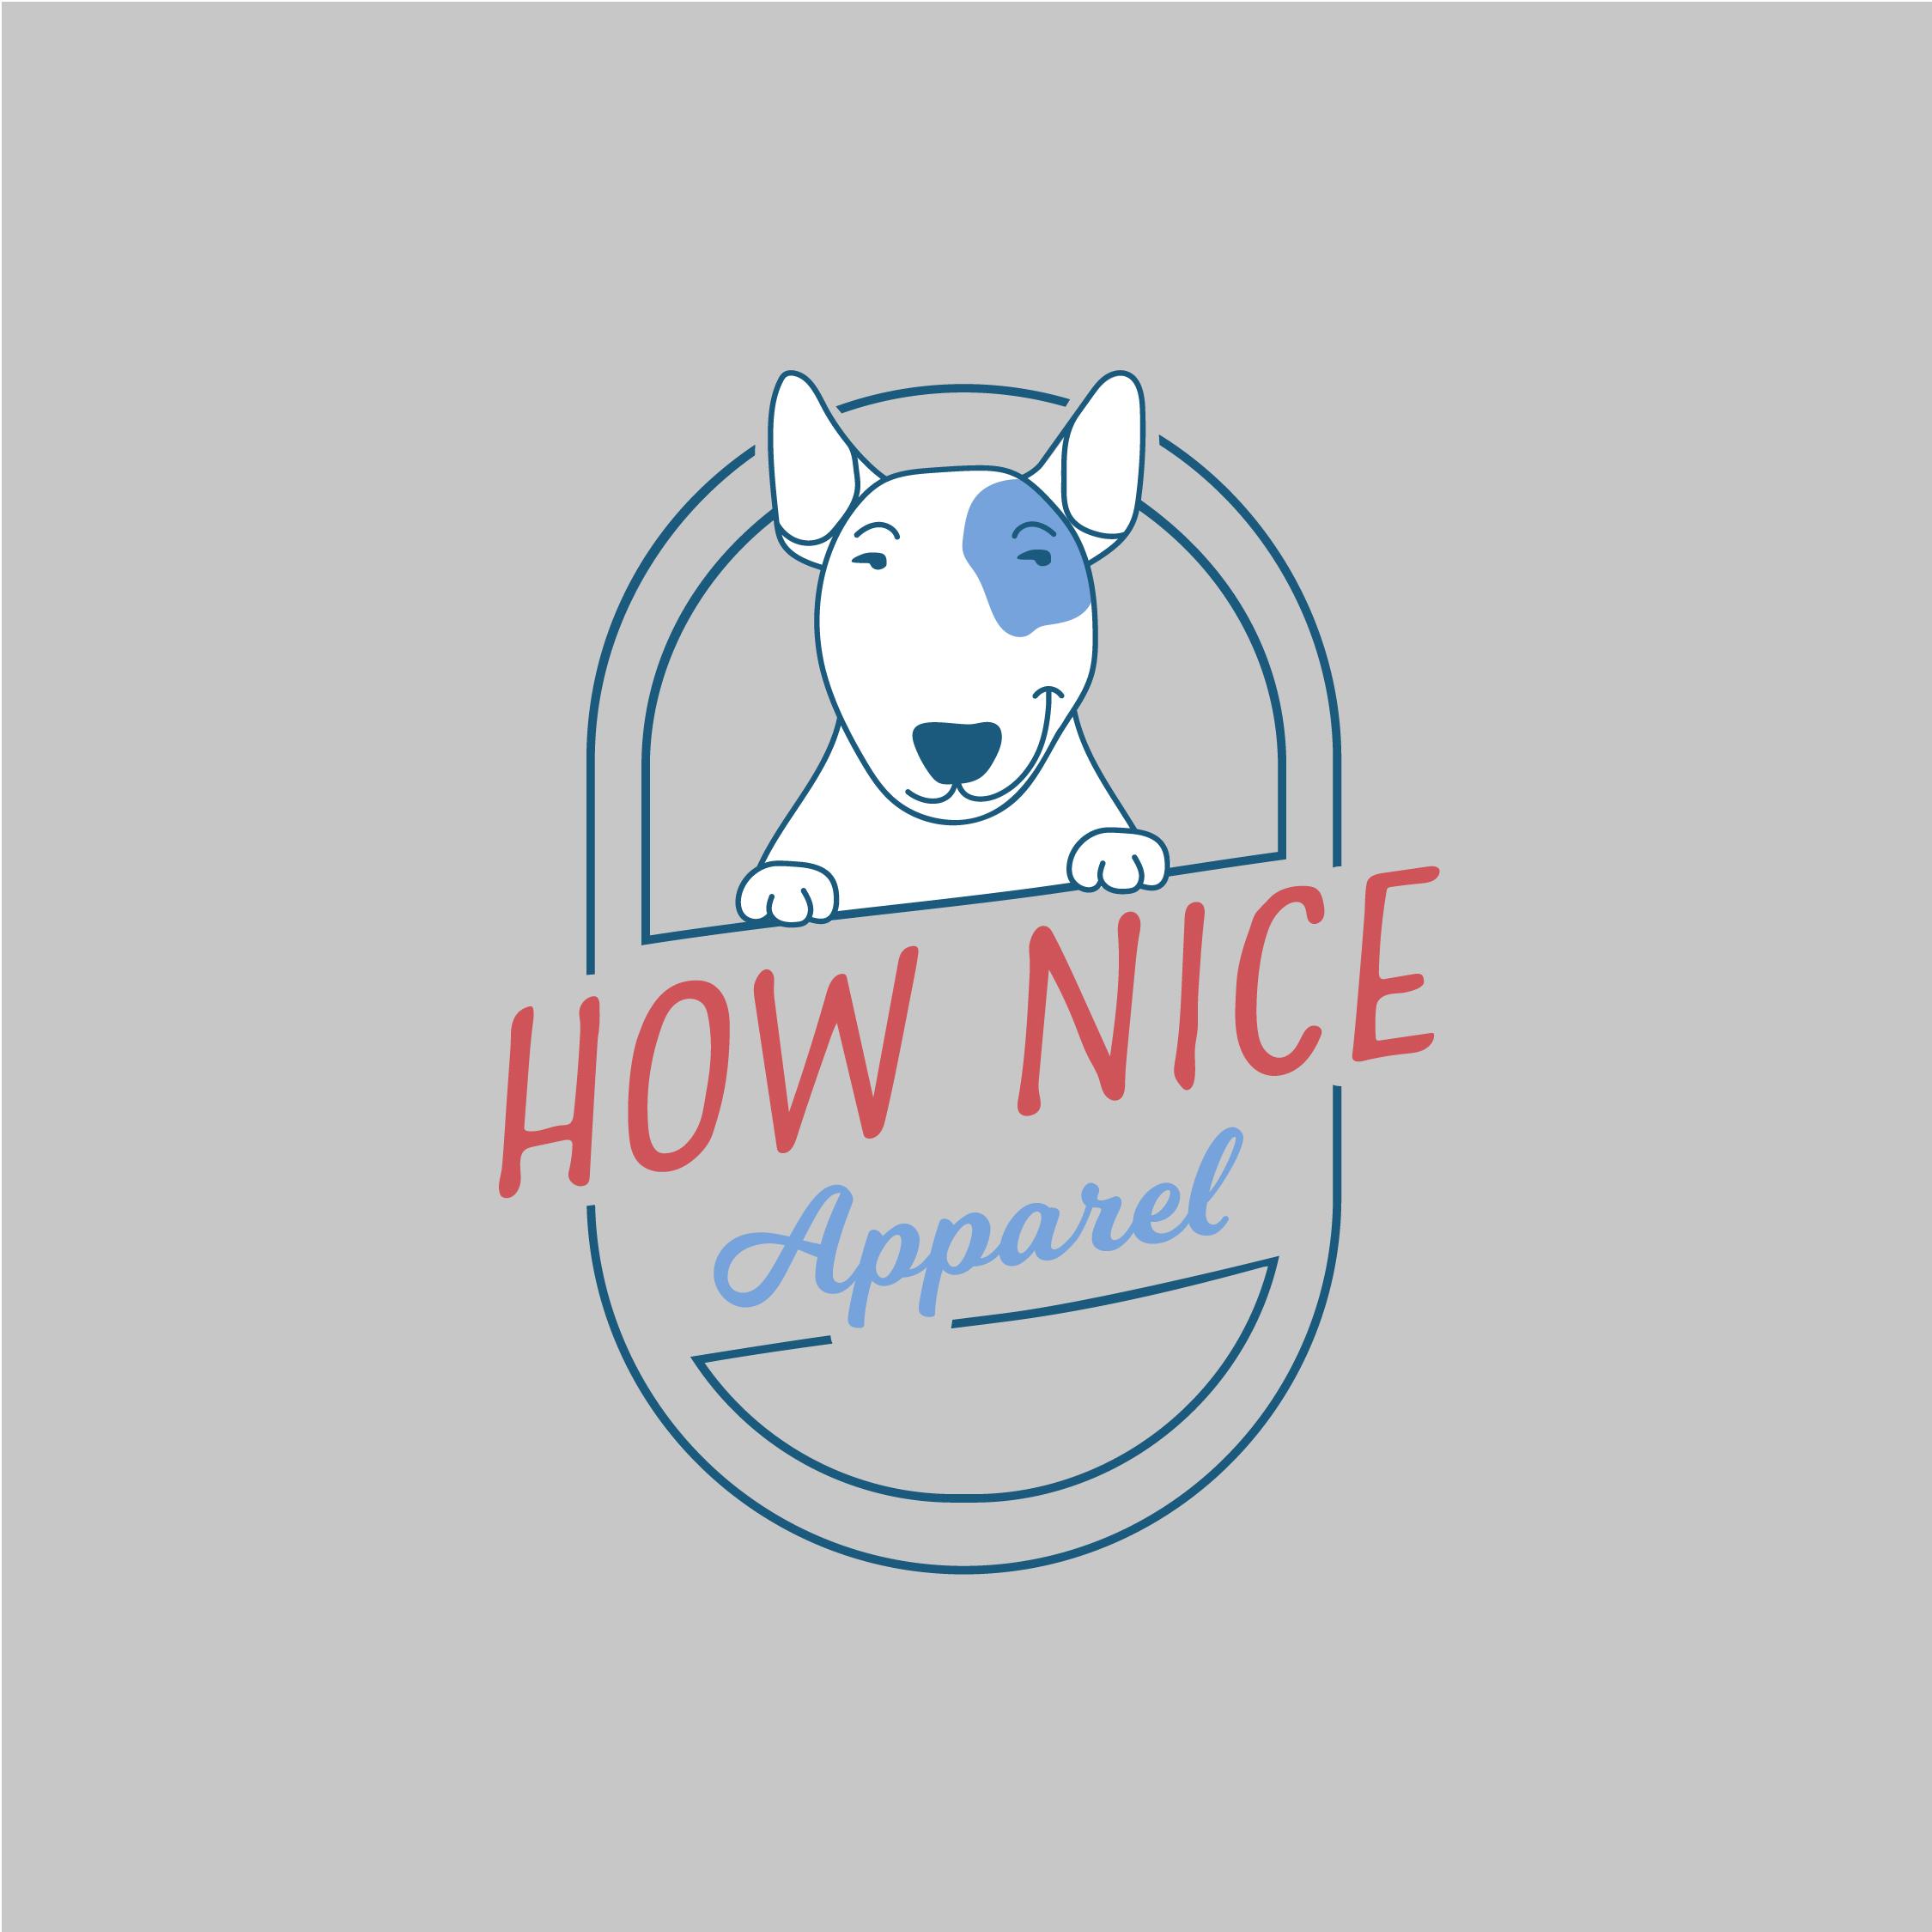 HowNice-Porfolio-01.jpg